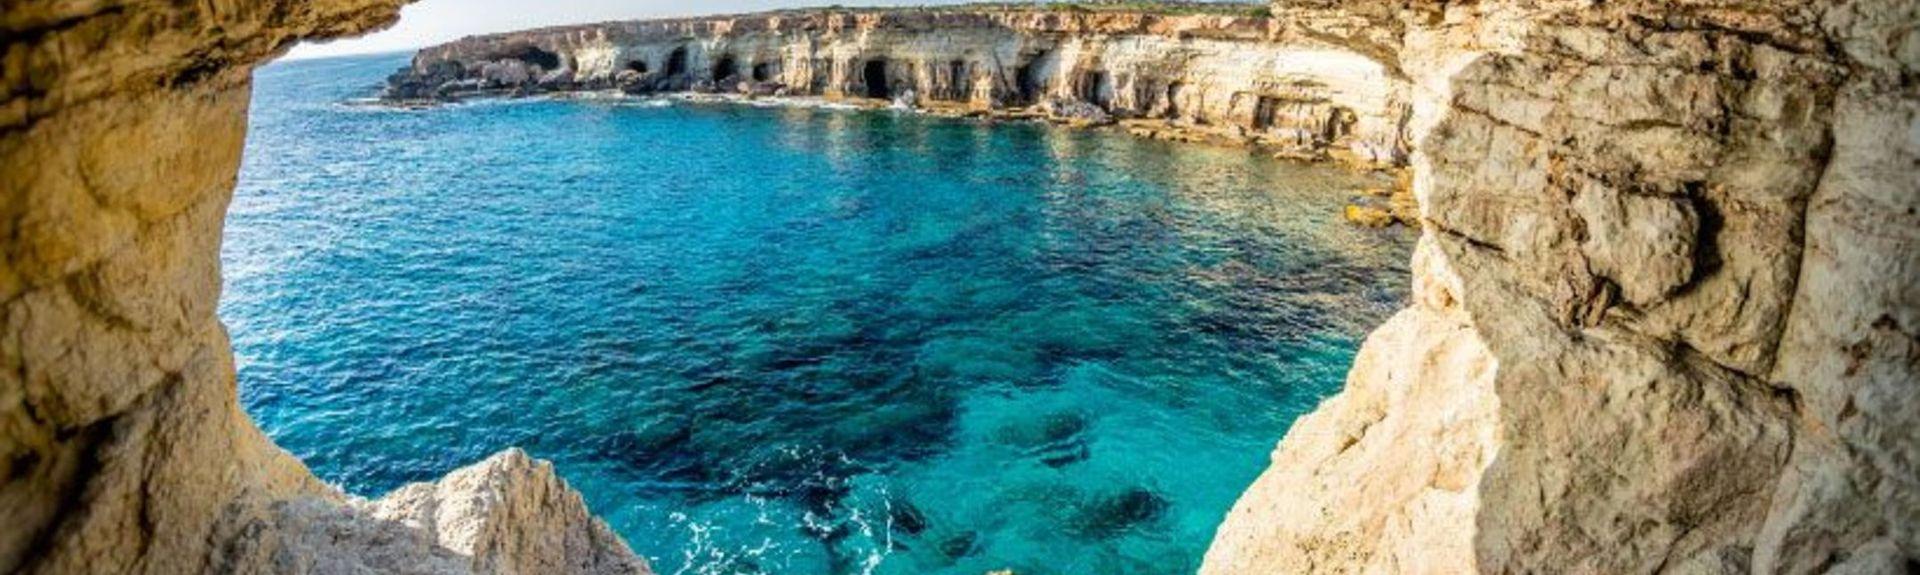 Ayia Thekla, Sotira, Distrito de Famagusta, Chipre